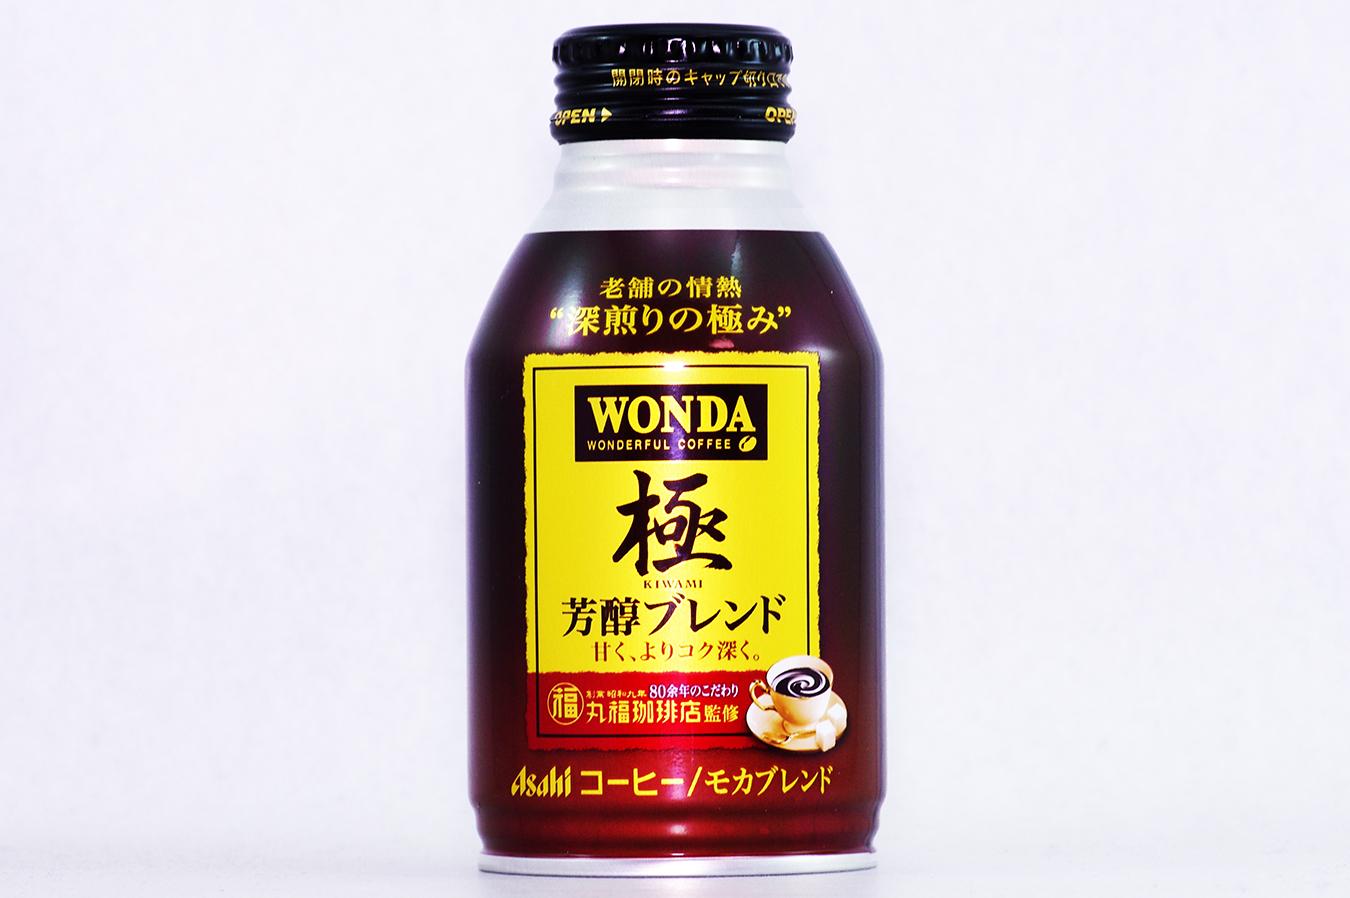 WONDA 極 芳醇ブレンド 2017年3月